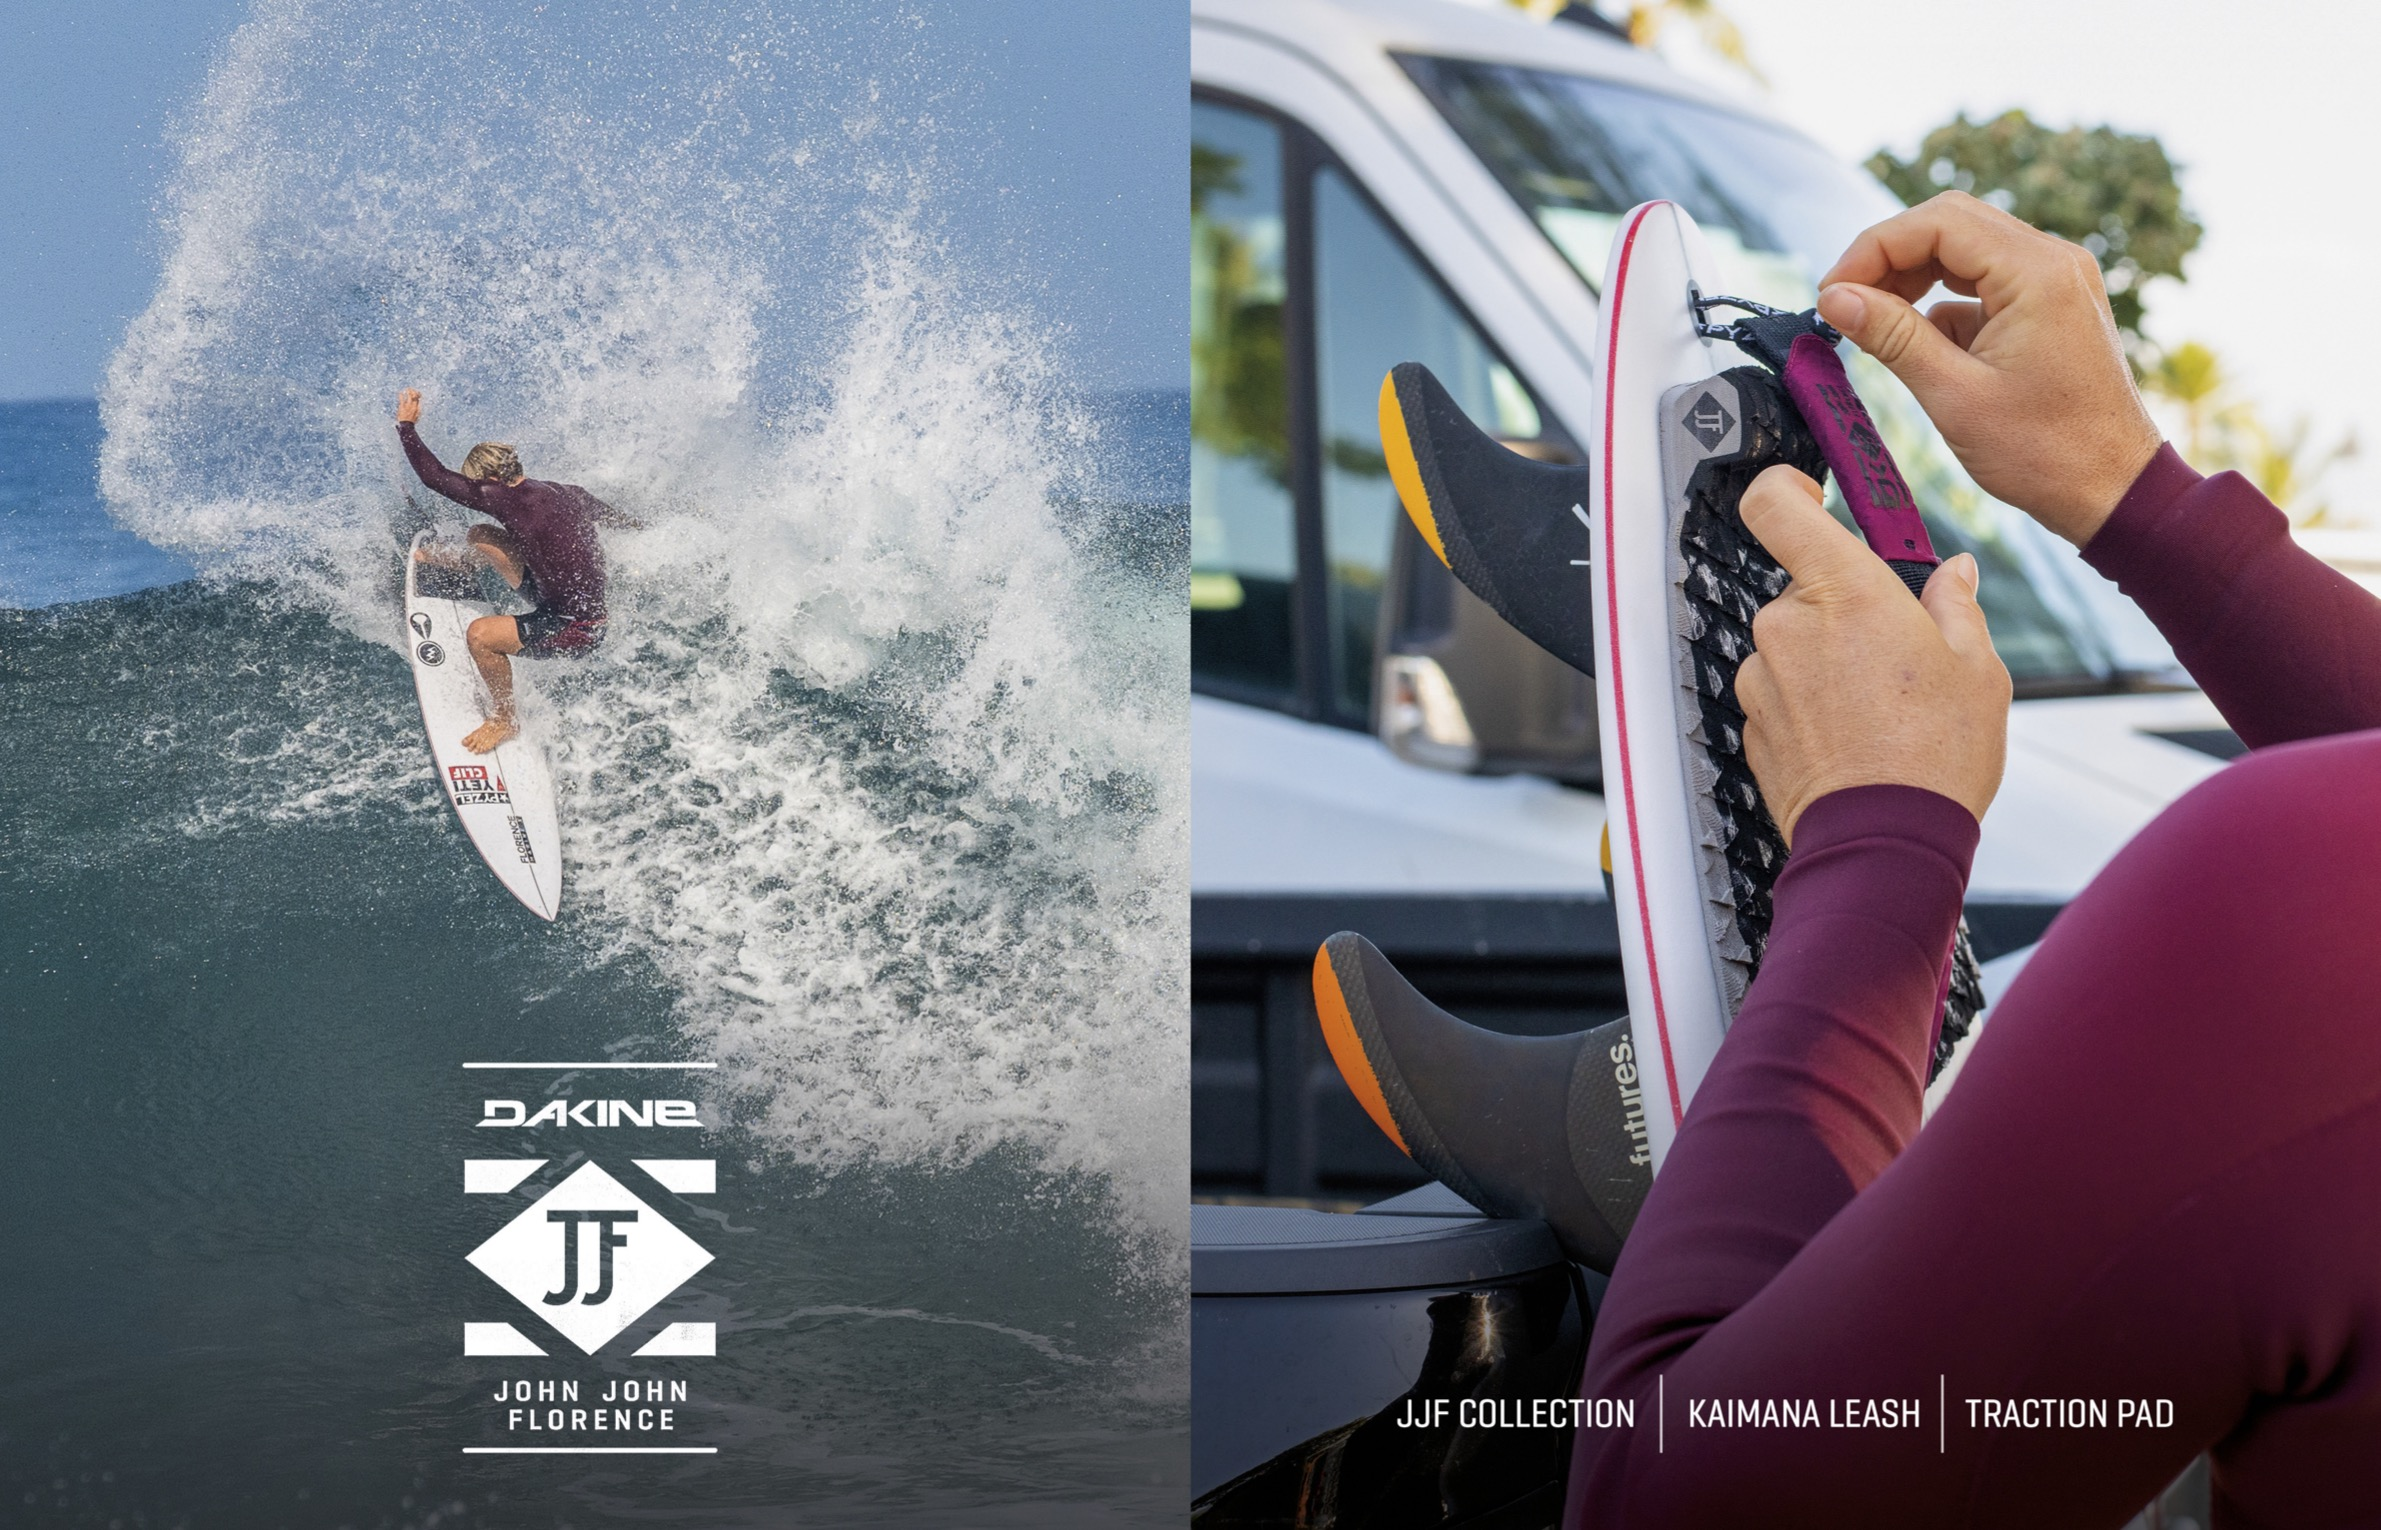 106 DAKINE surfboards